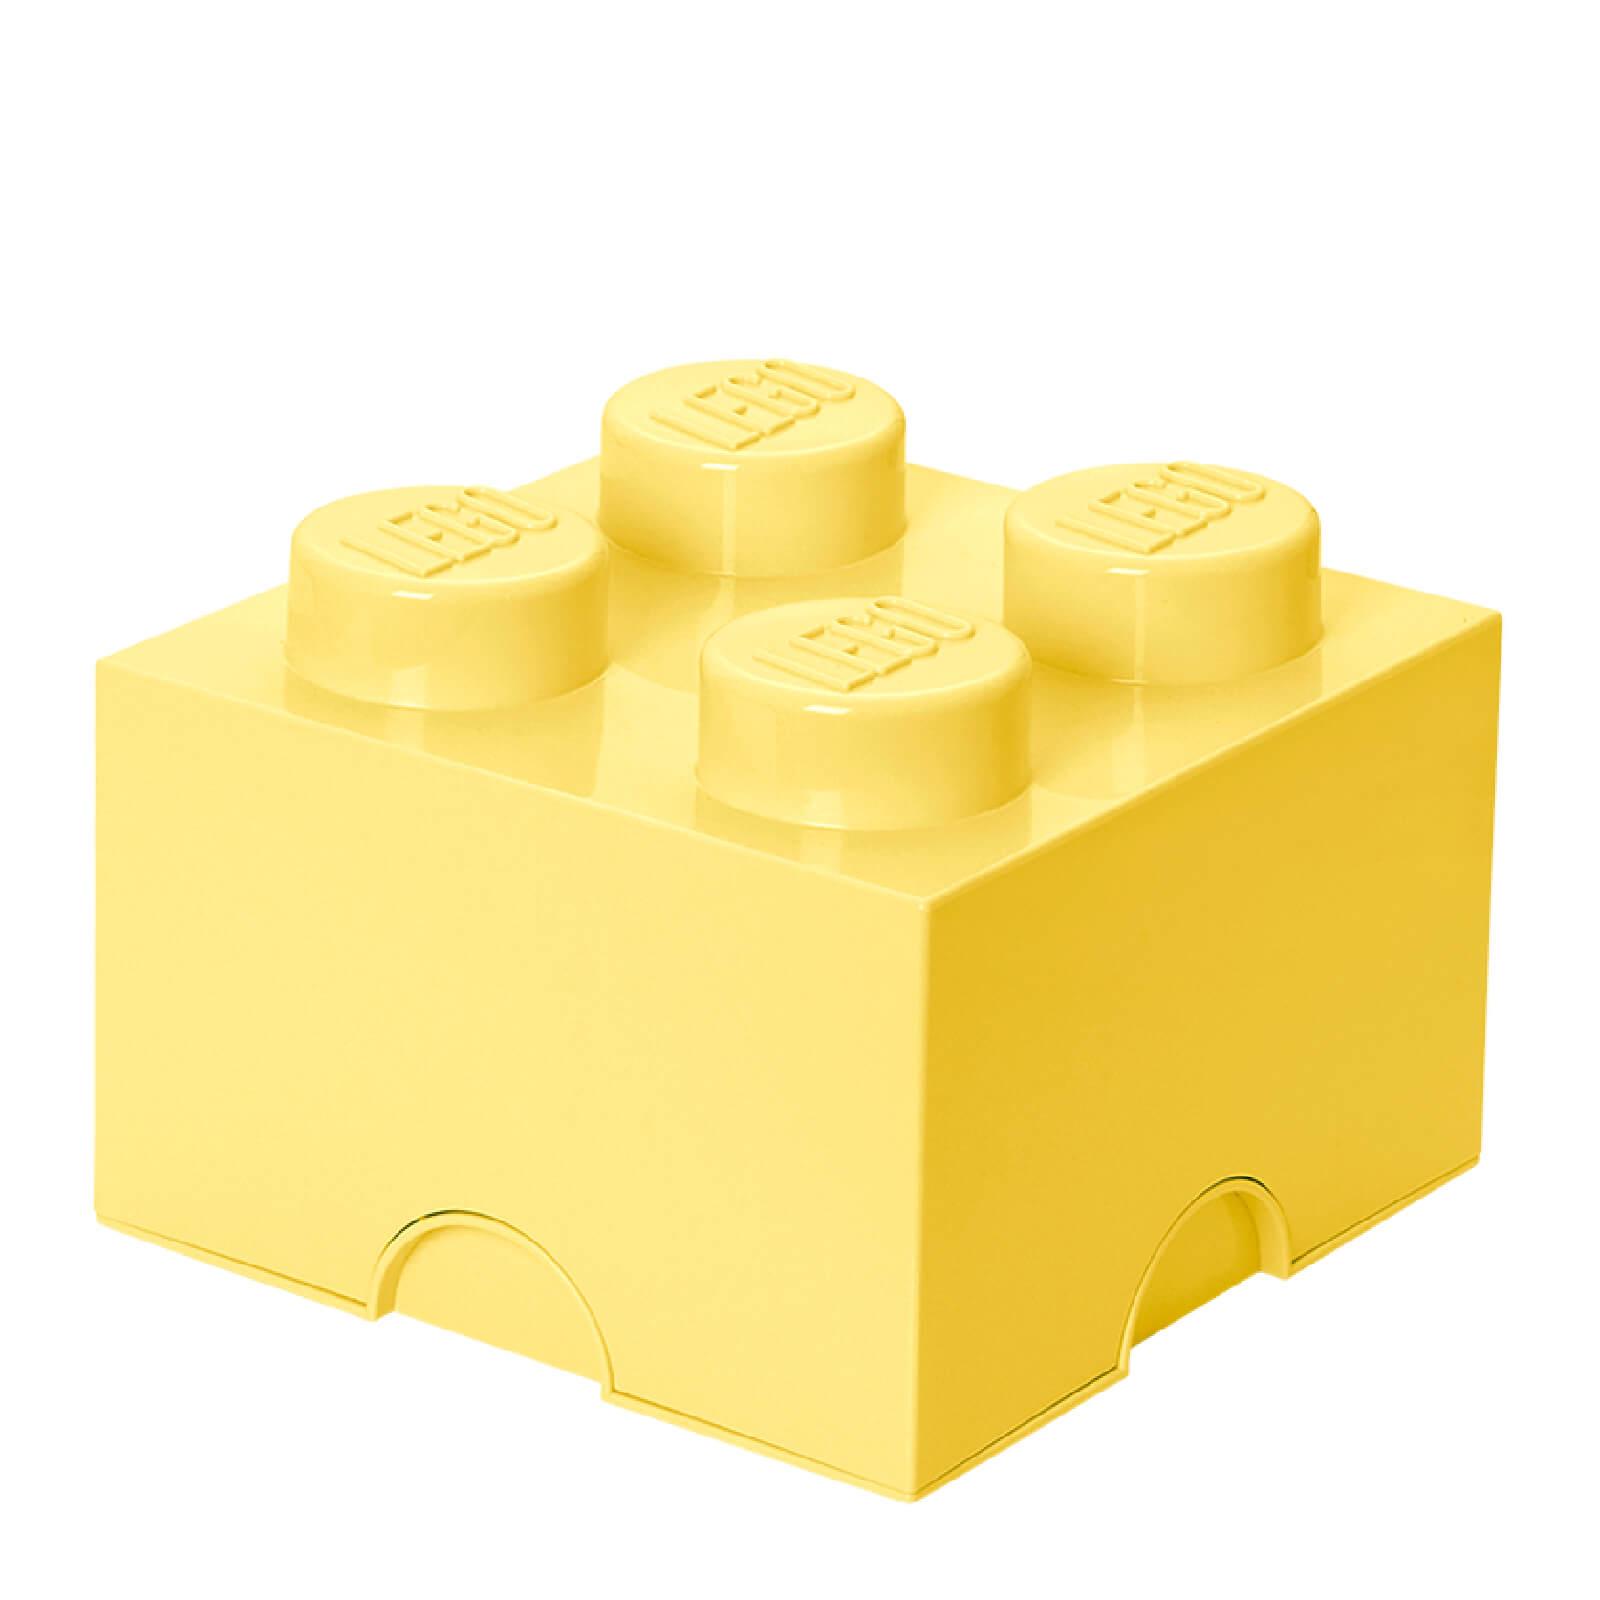 Lego Storage Brick 4 - Cool Yellow